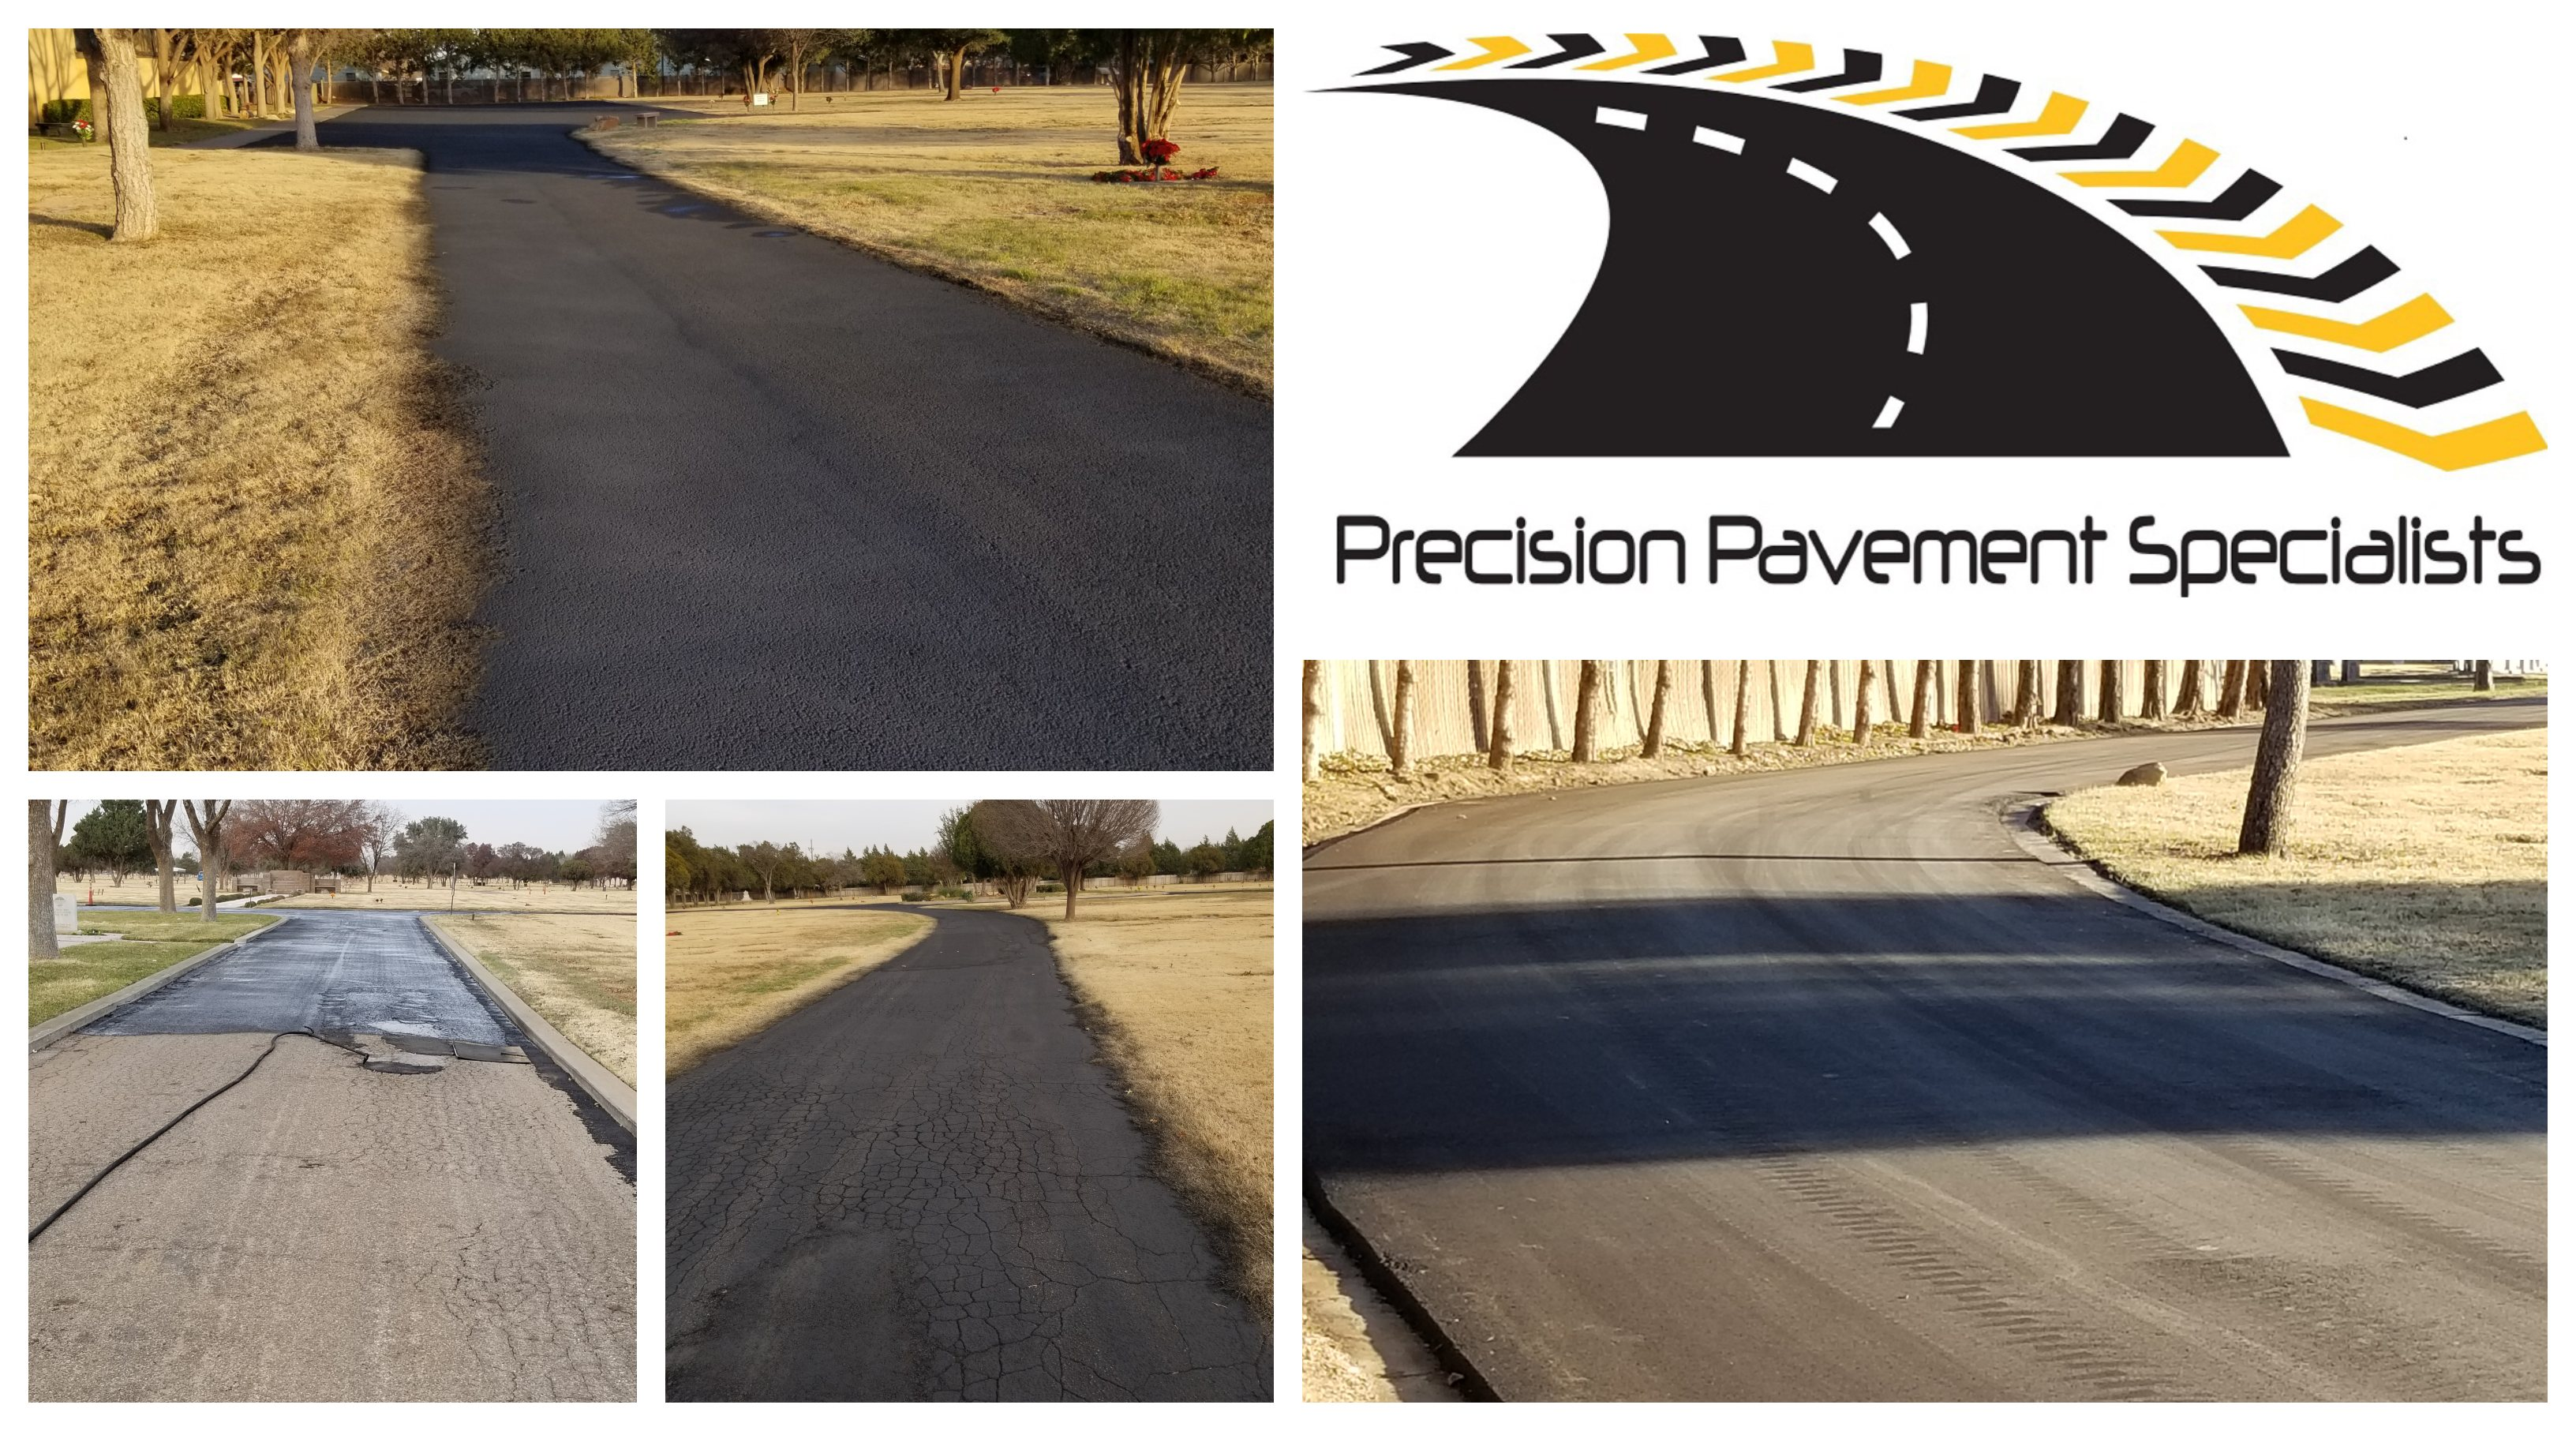 Precision Pavement Specialists image 55